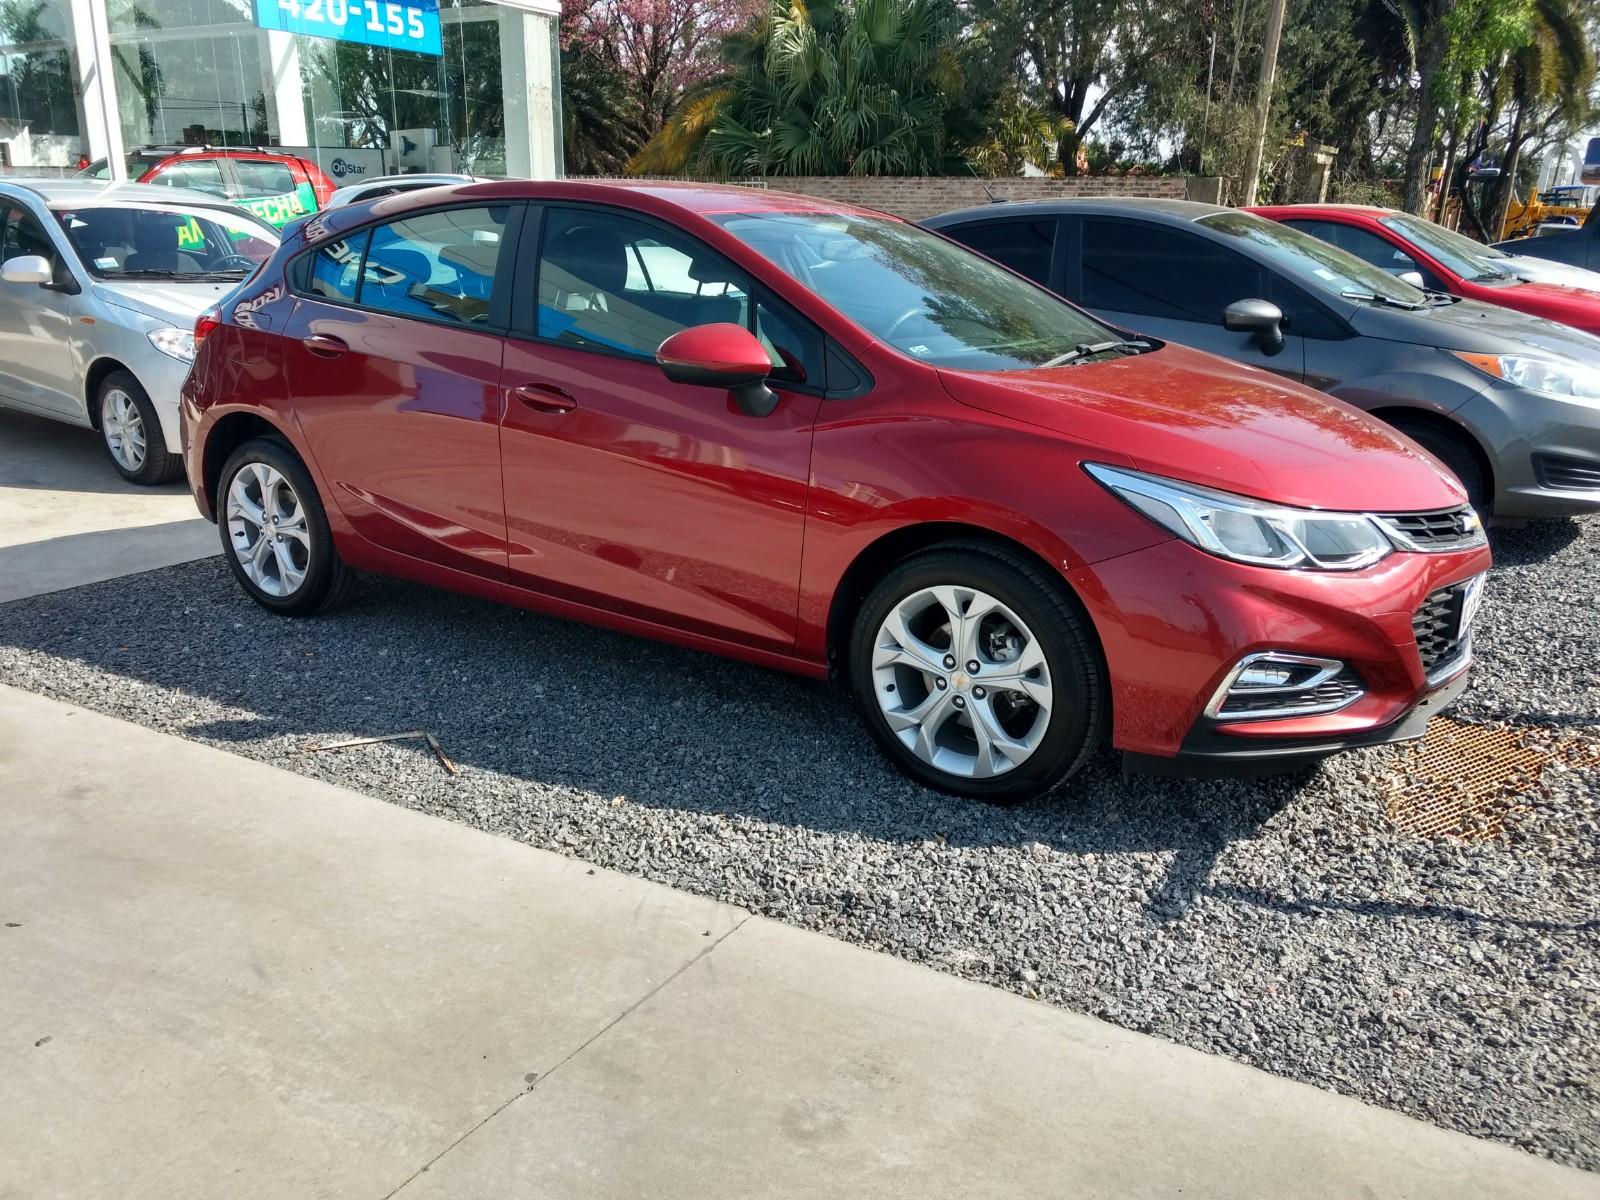 2018 Chevrolet Cruze LT 5P 1.4